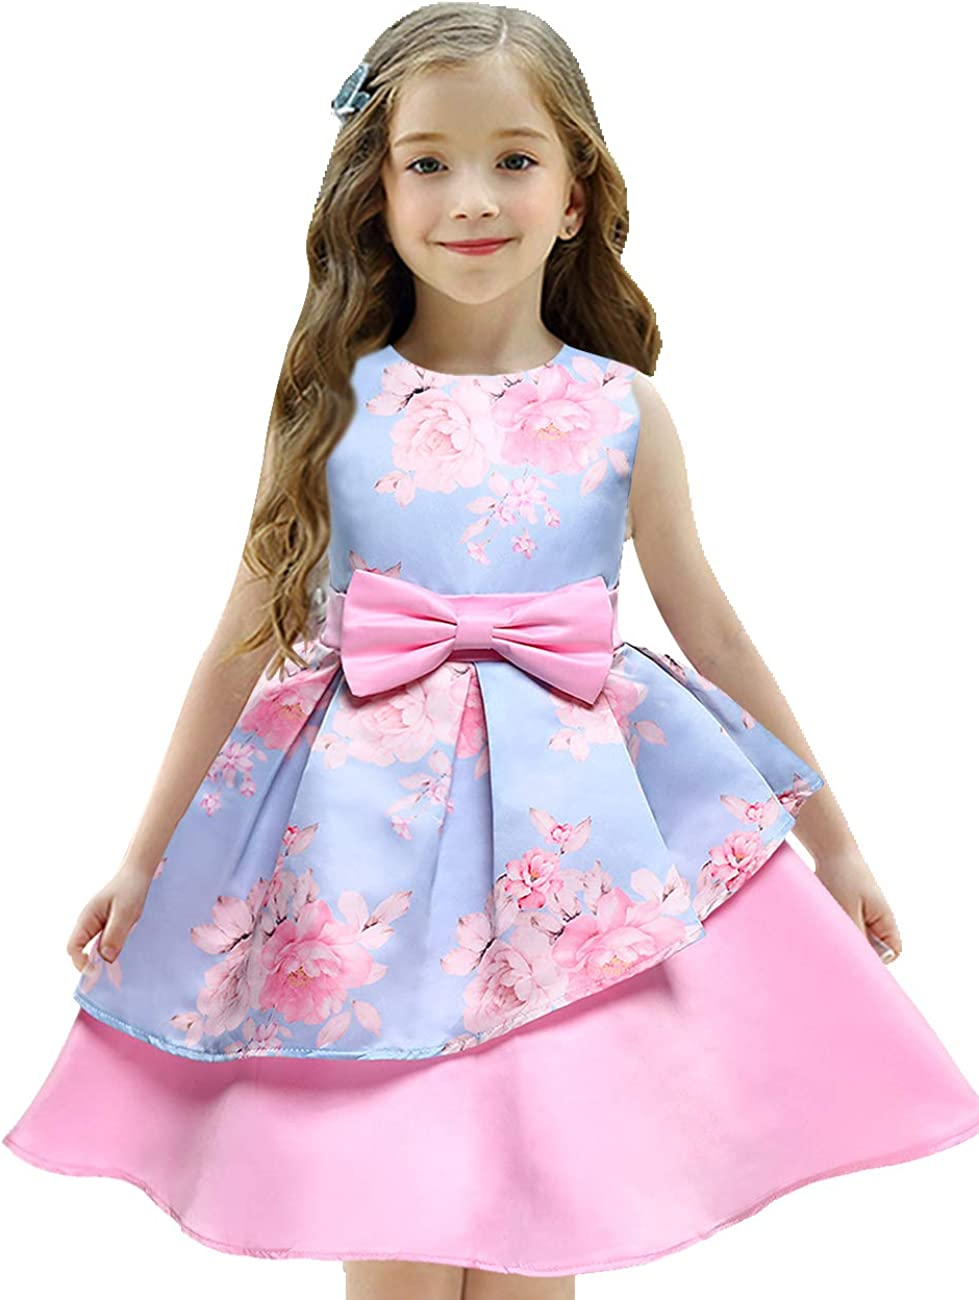 Amazon Com 2020 Girls Dress Christmas Santa Snow Silk Poinsettia Print Toddler Girls Xmas Reindeer Holiday Party Dresses Clothing